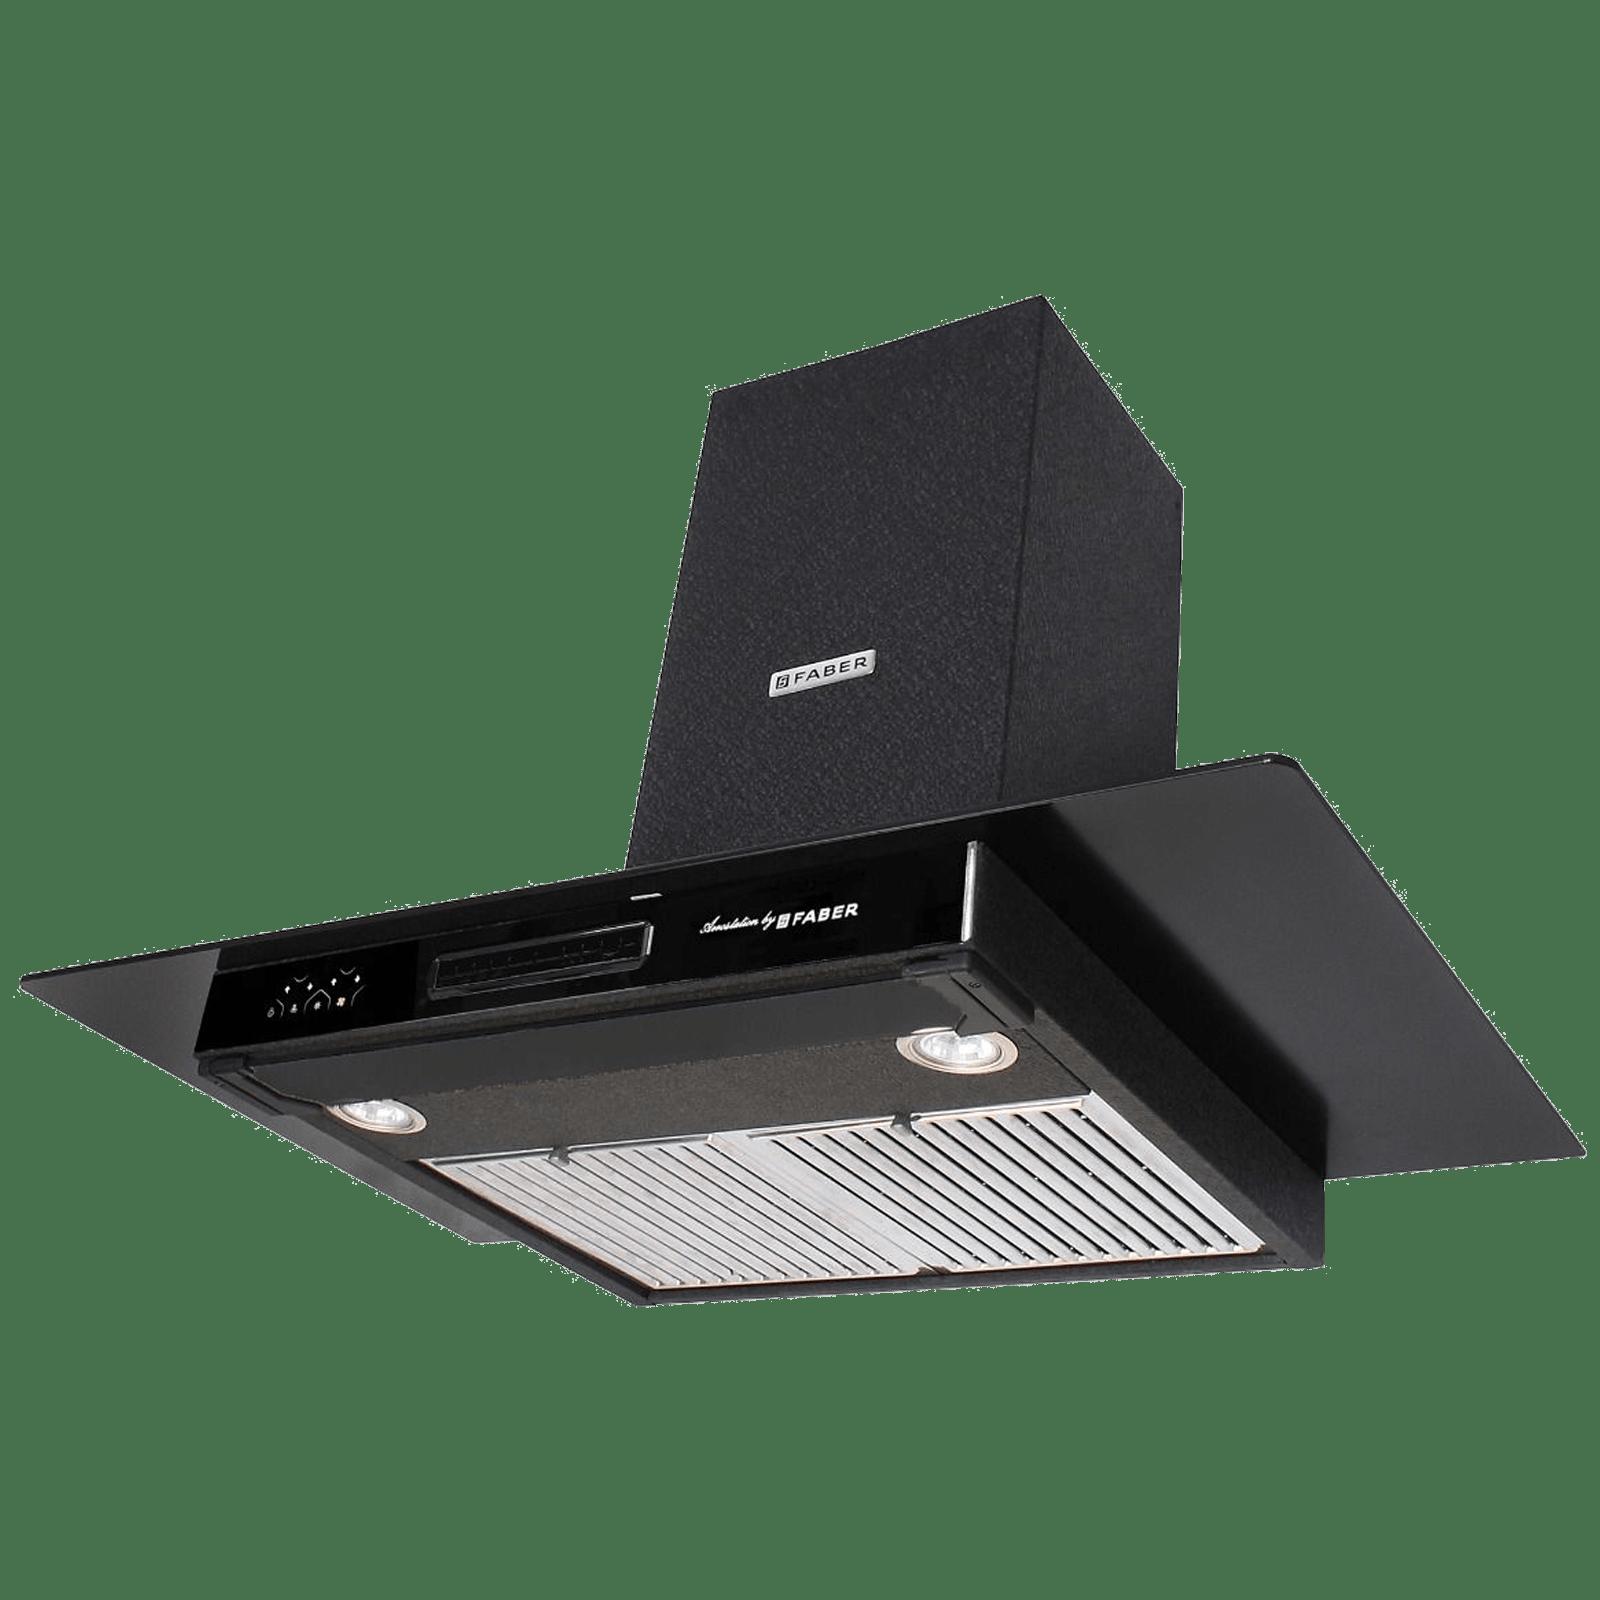 Faber 3N1 Aerost. Star Pro 3D AB TC 1095 m³/hr 90cm Wall Mount Chimney (3 Layer Baffle Filters, 325.0605.949, Alligator Black)